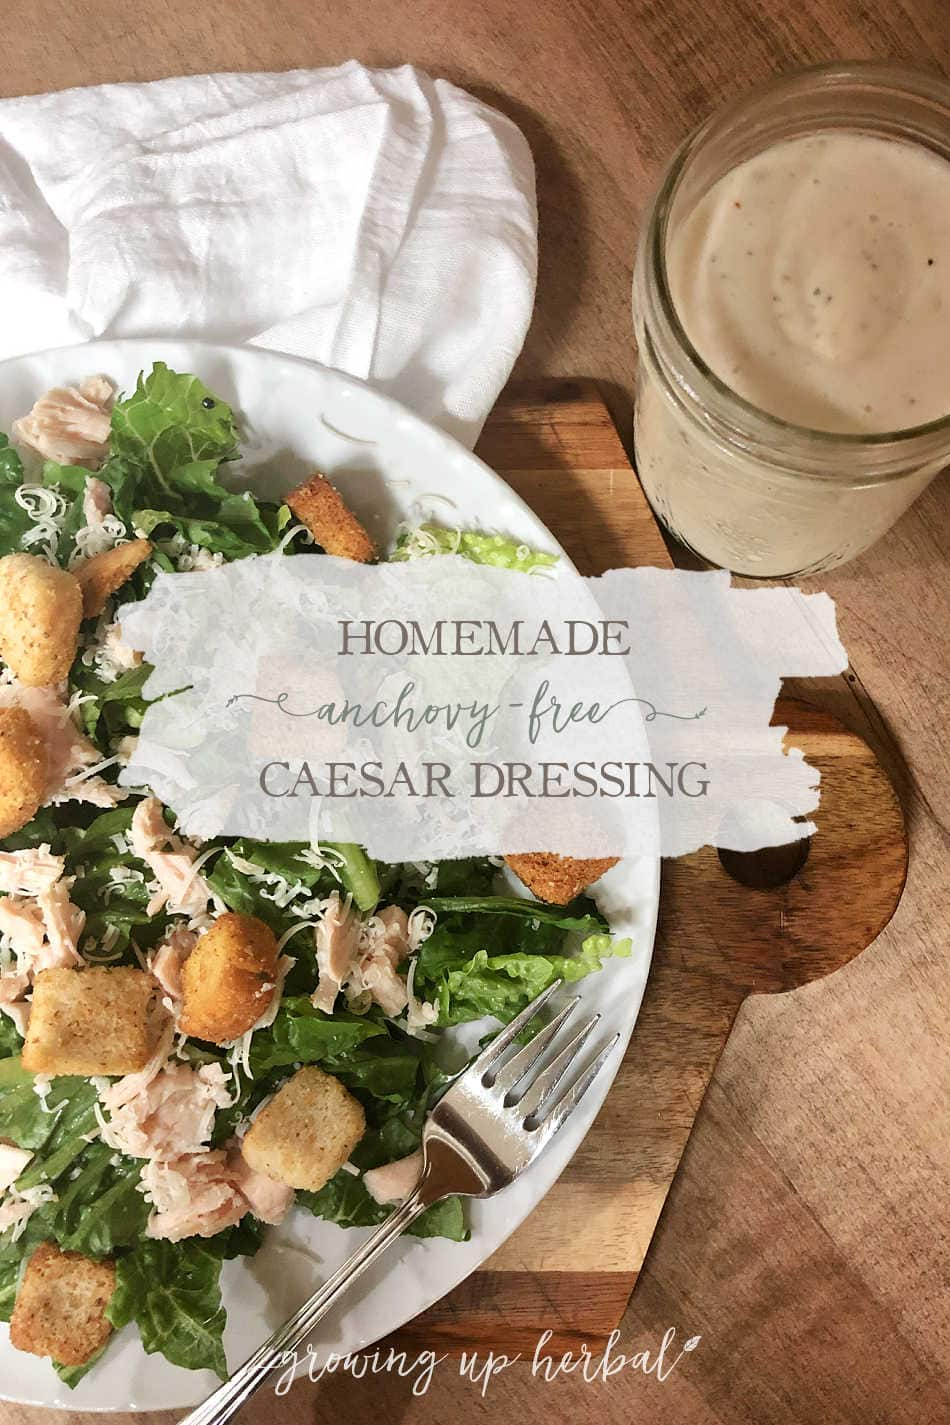 Chicken Caesar Salad & Homemade (Anchovy-Free) Caesar Dressing